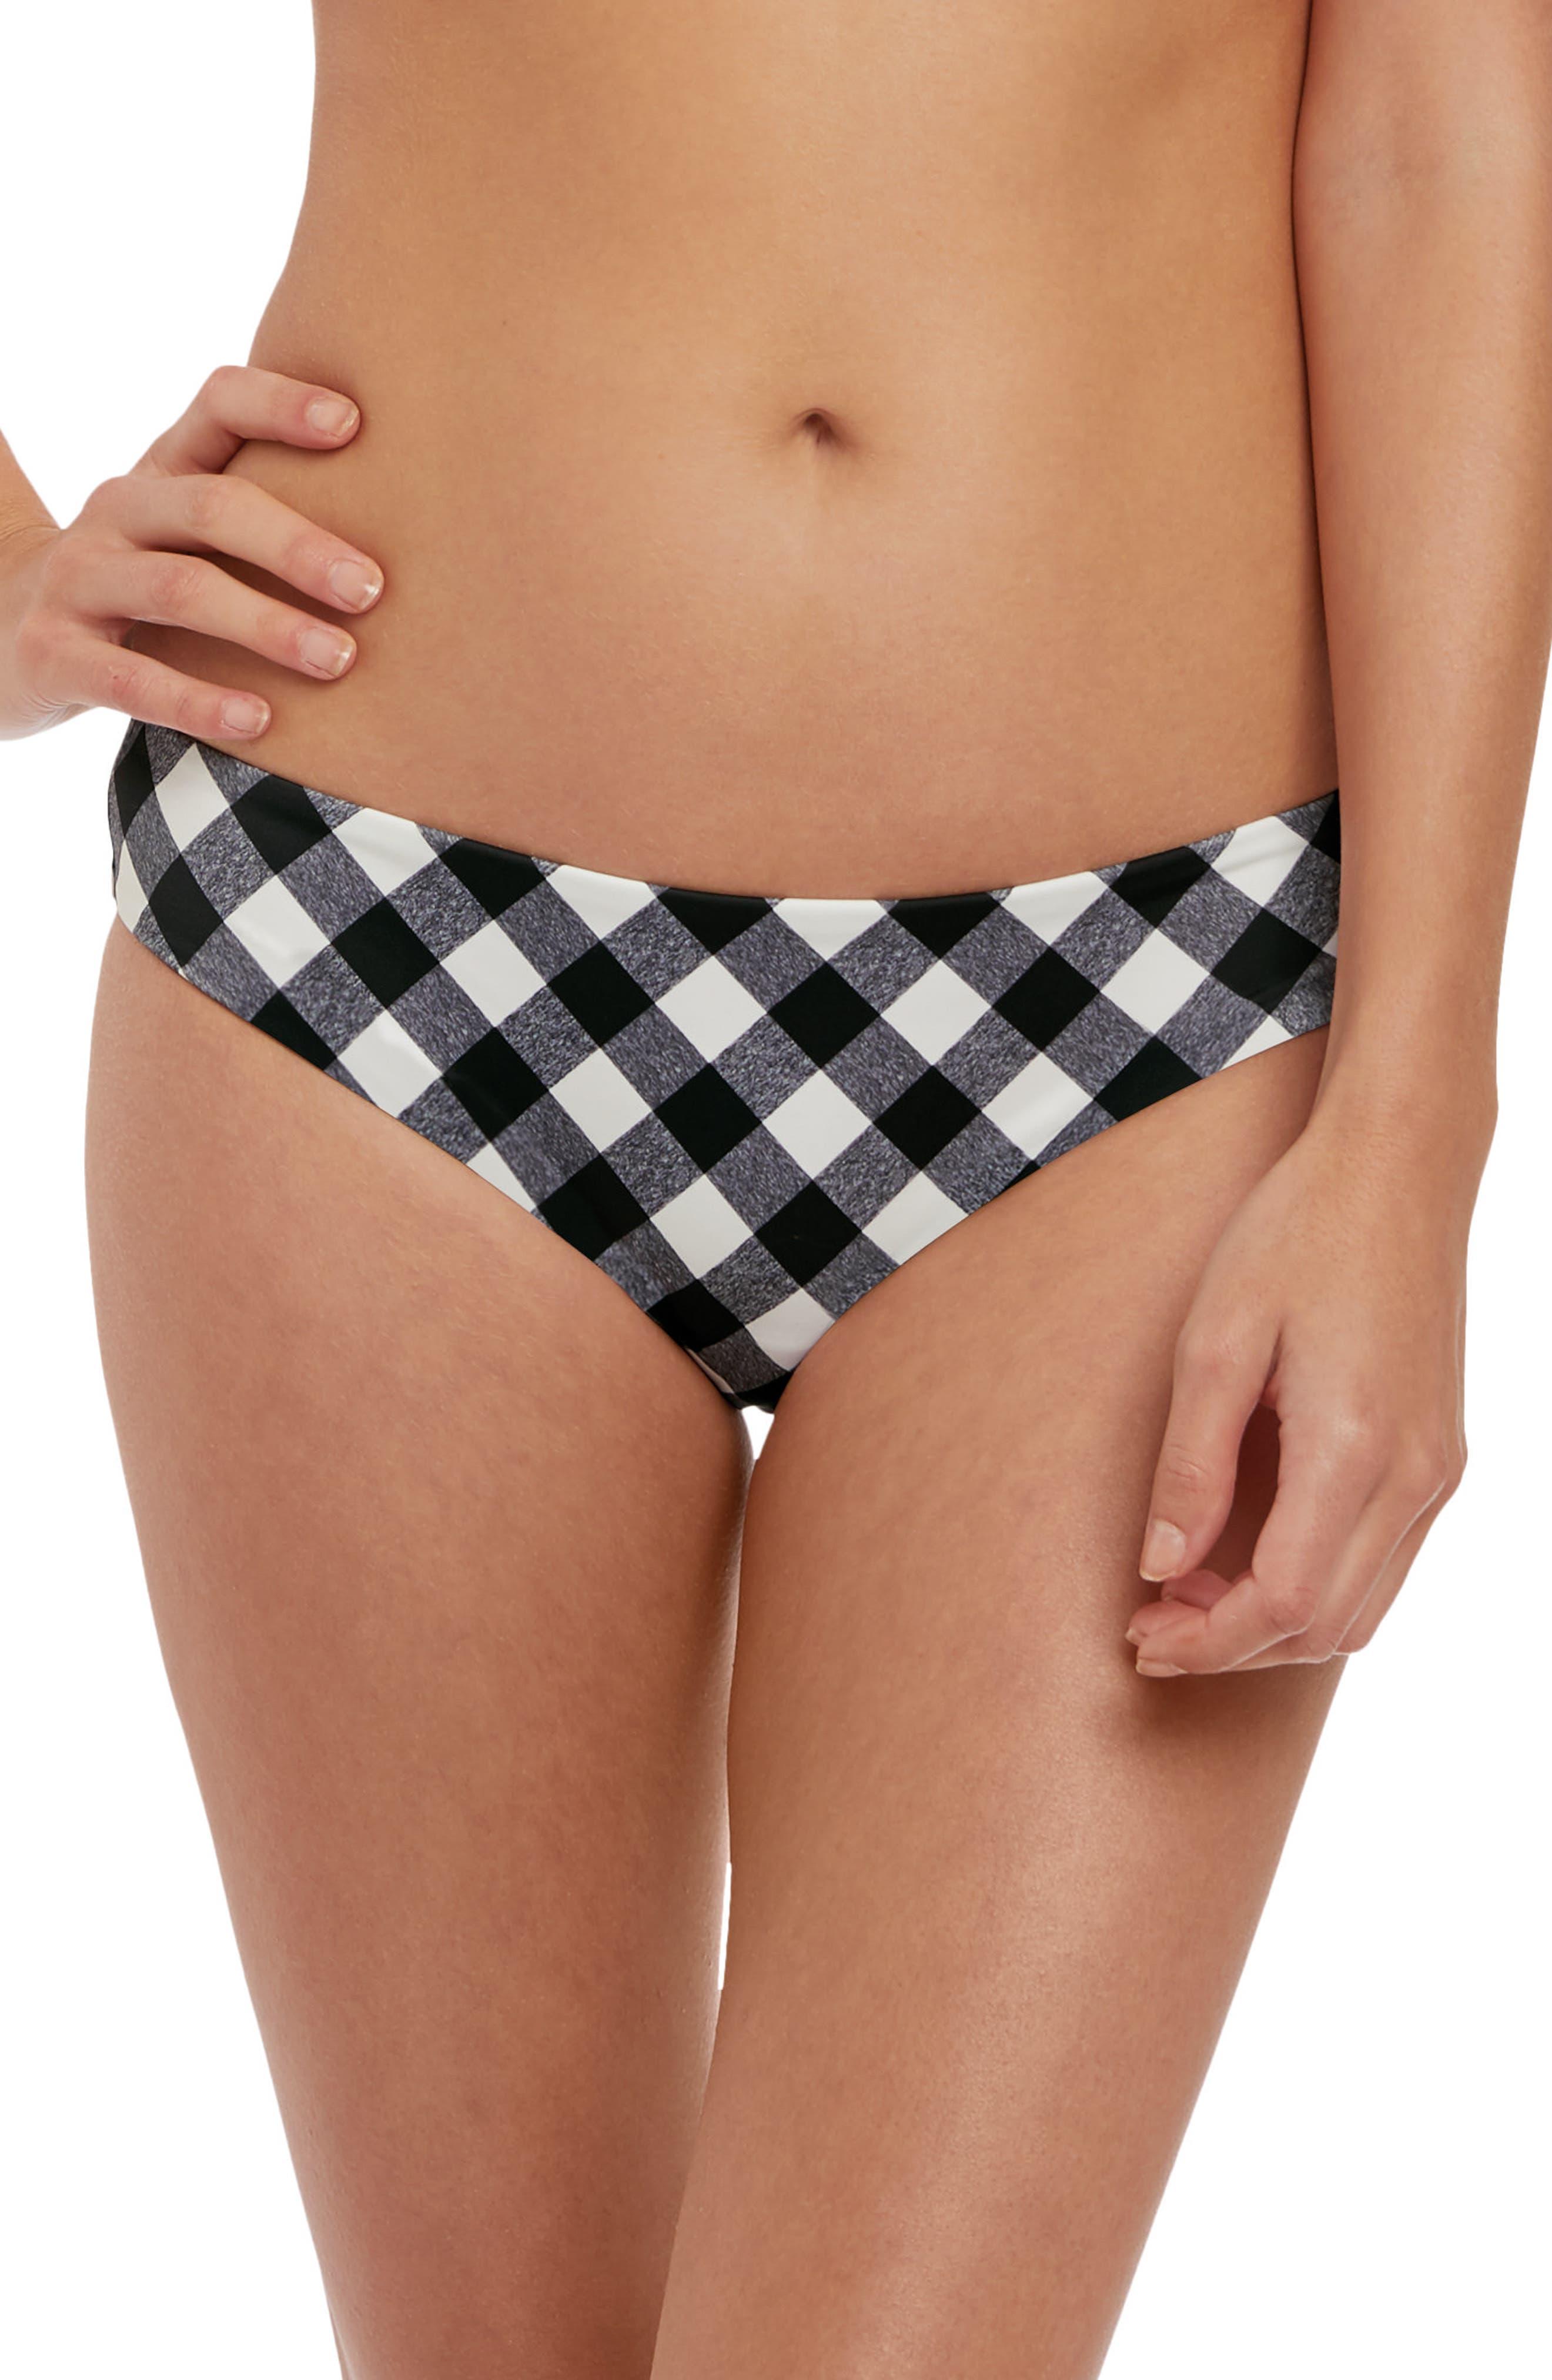 FREYA Totally Check Bikini Bottoms in Monochrome